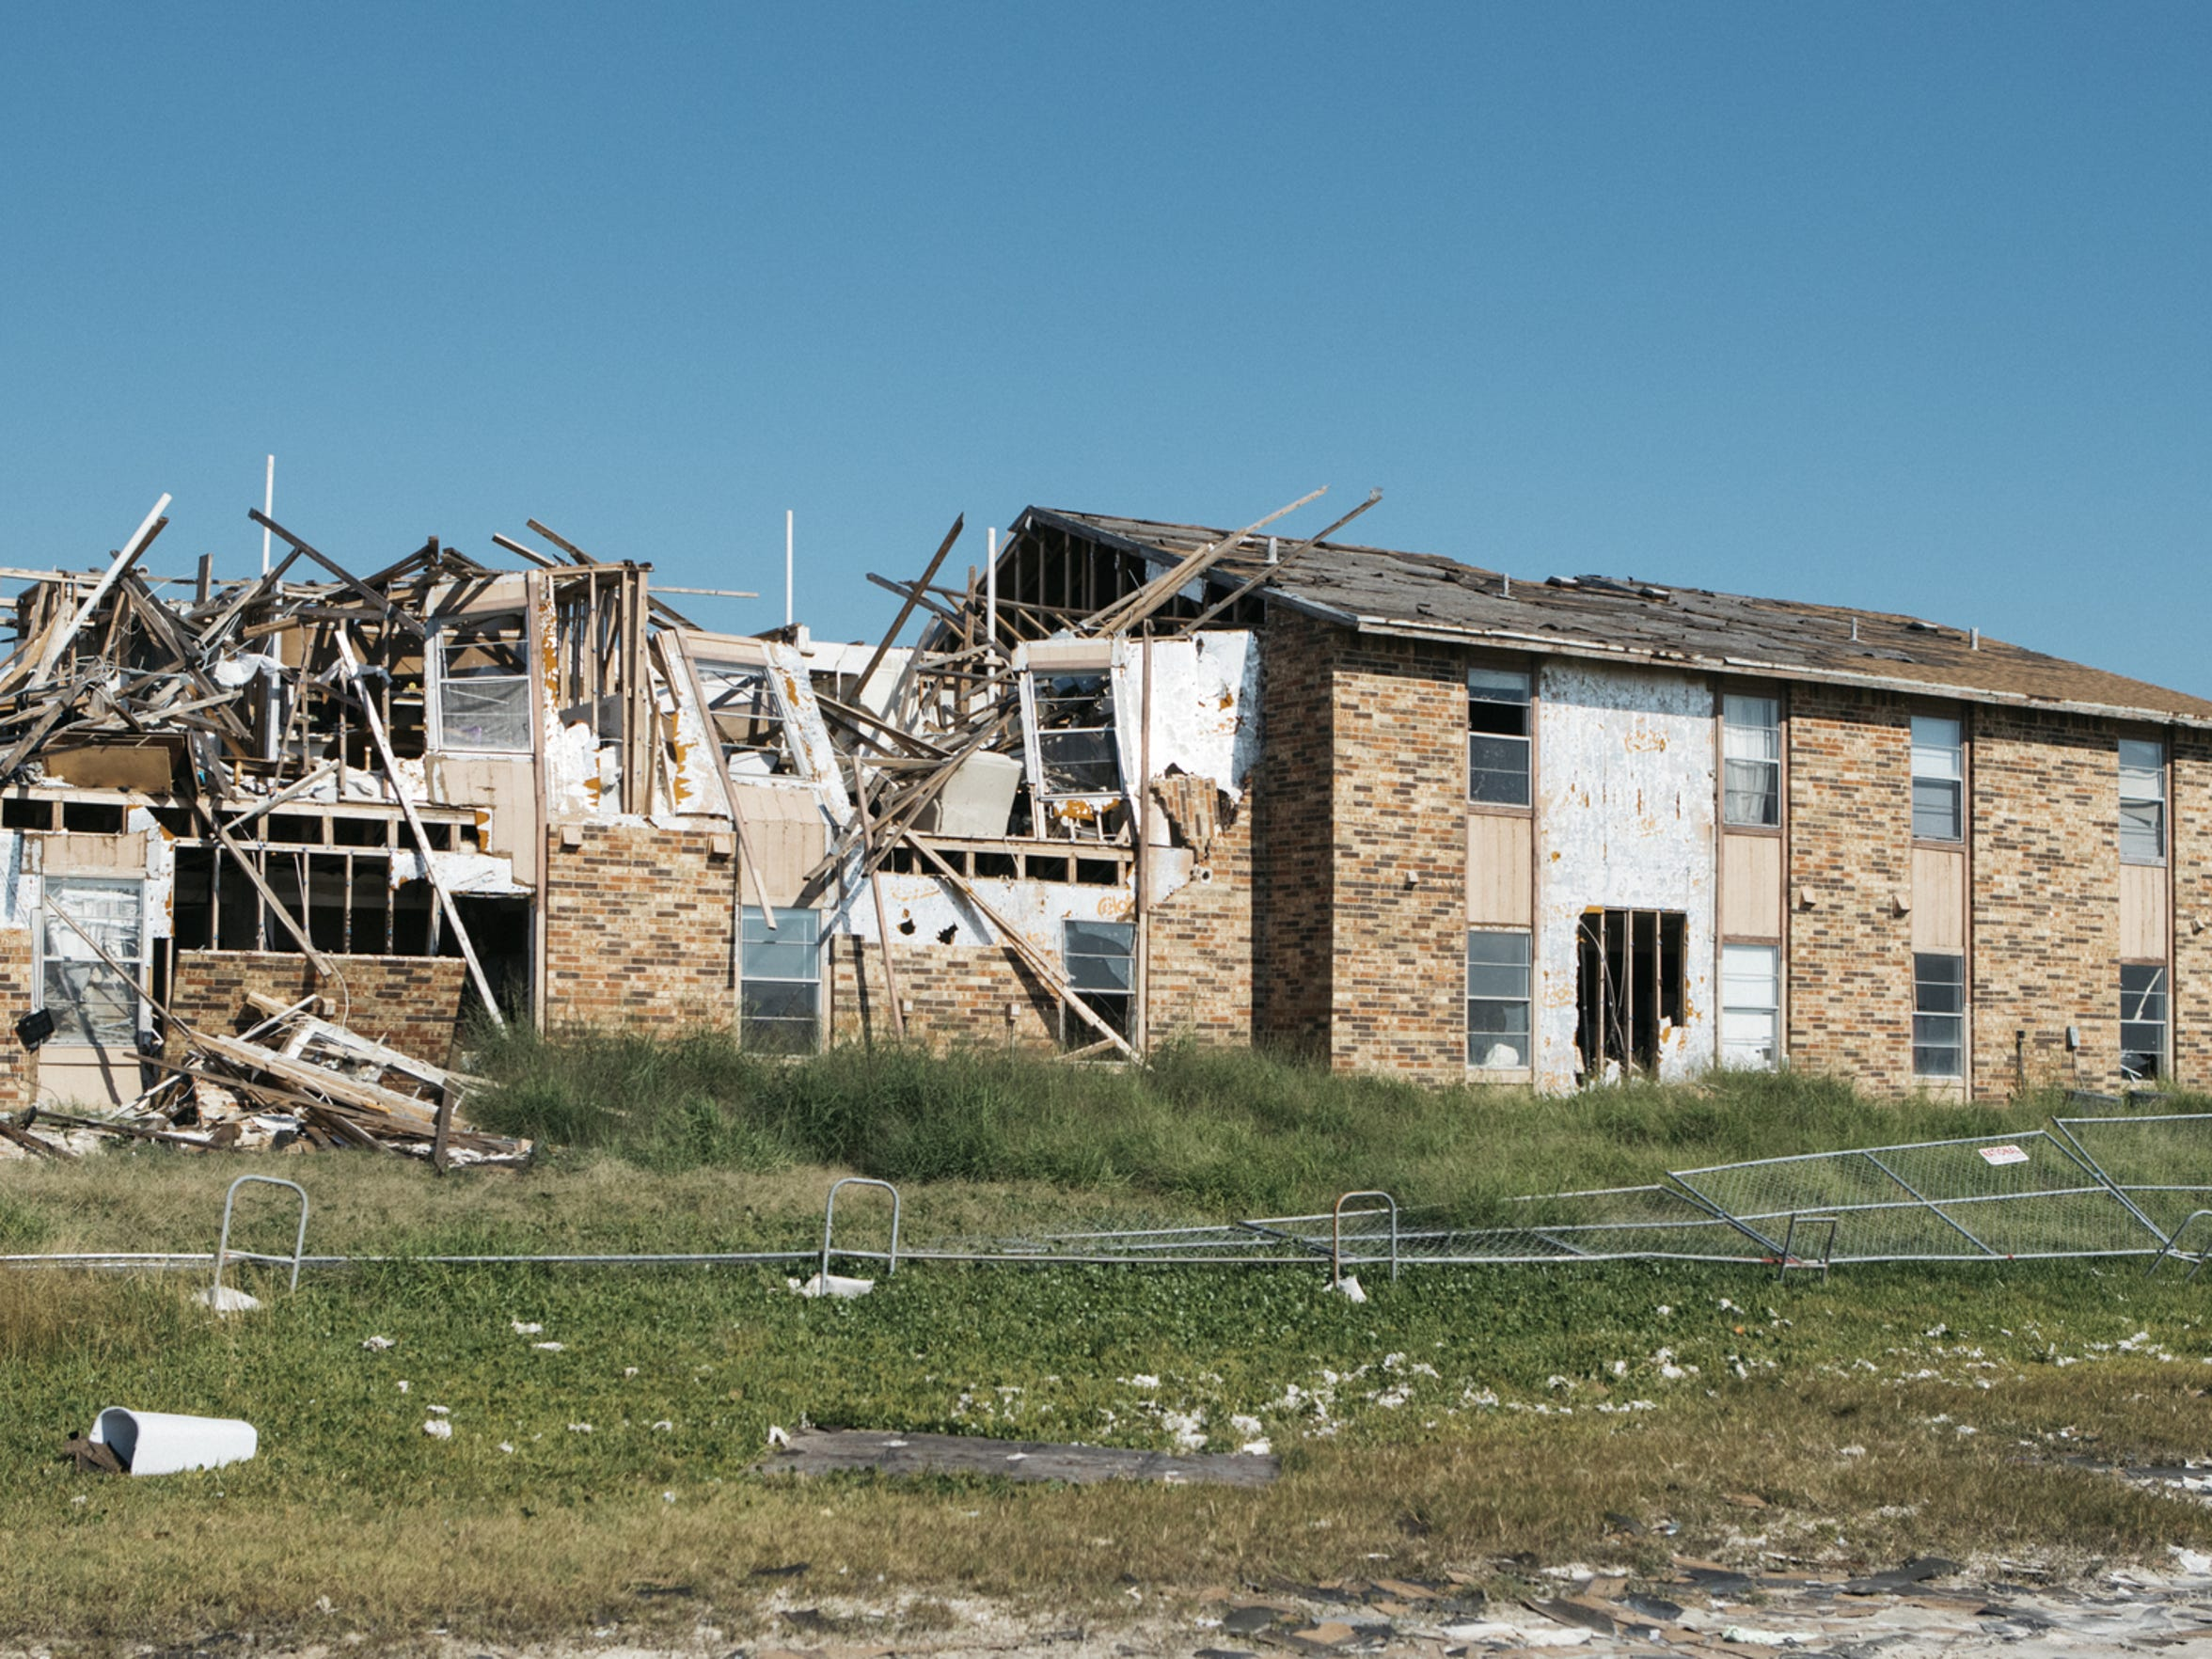 Destruction from Hurricane Harvey was widespread.